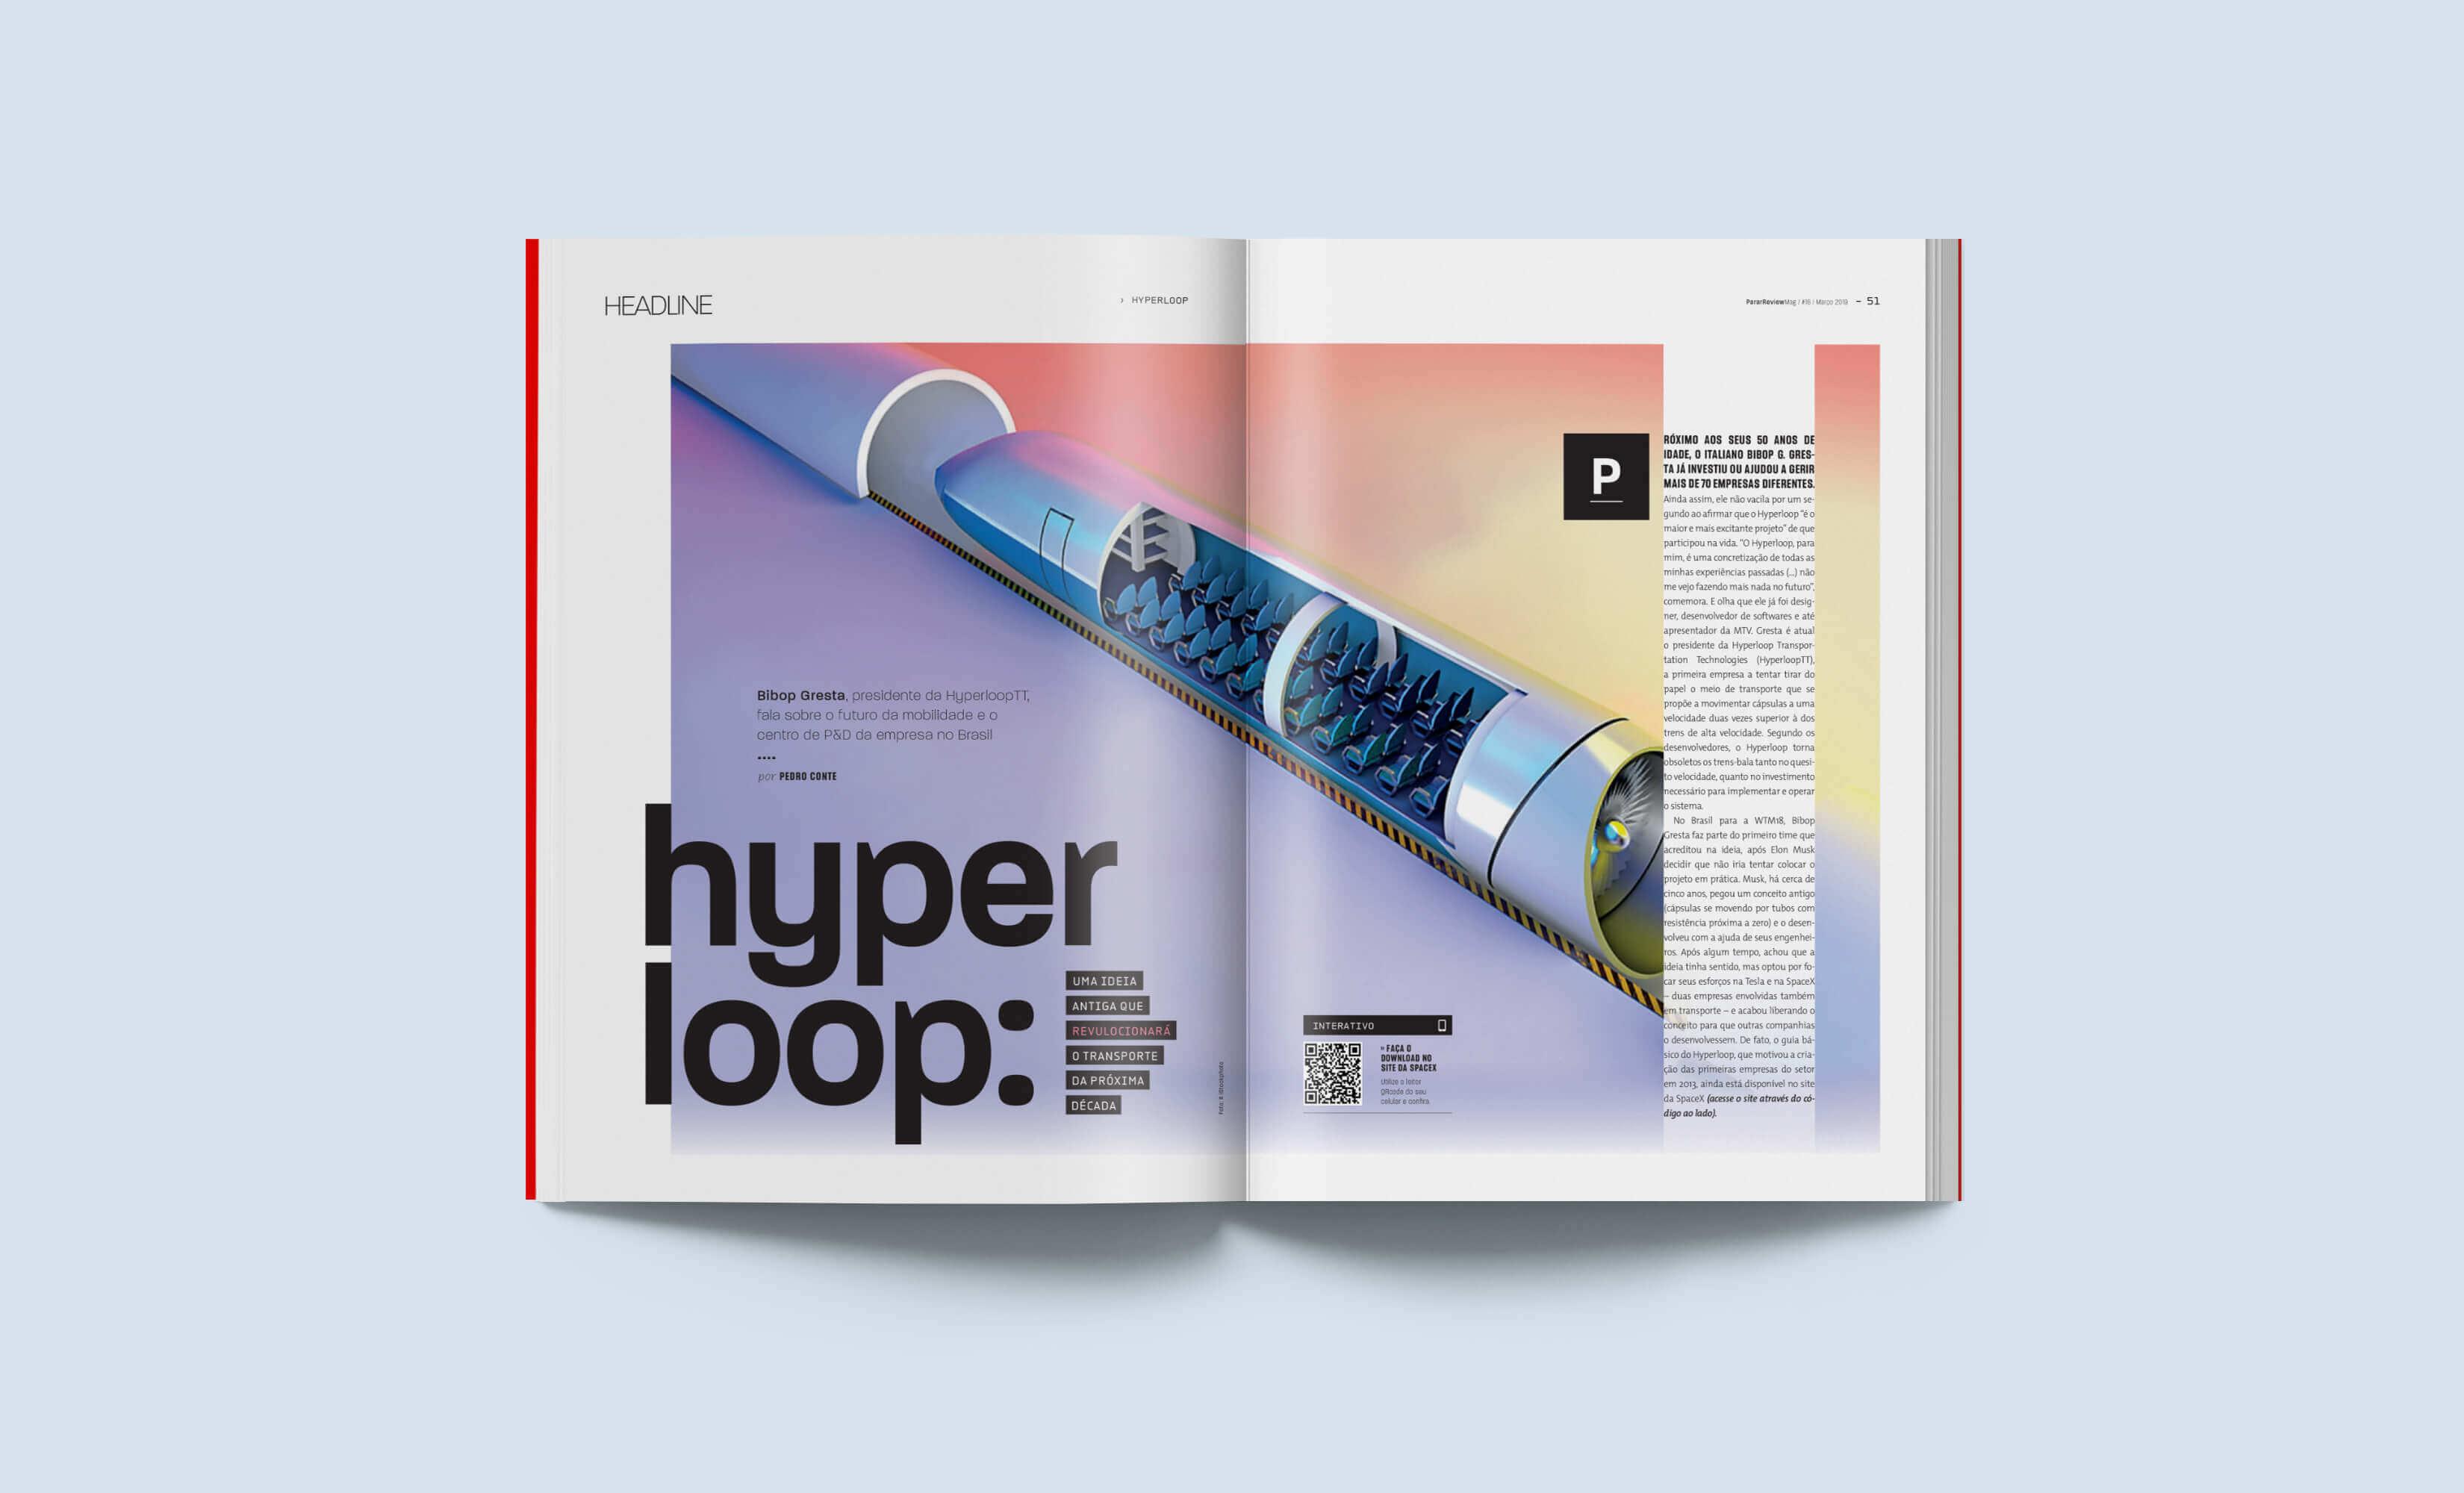 parar-magazine-hyperloop